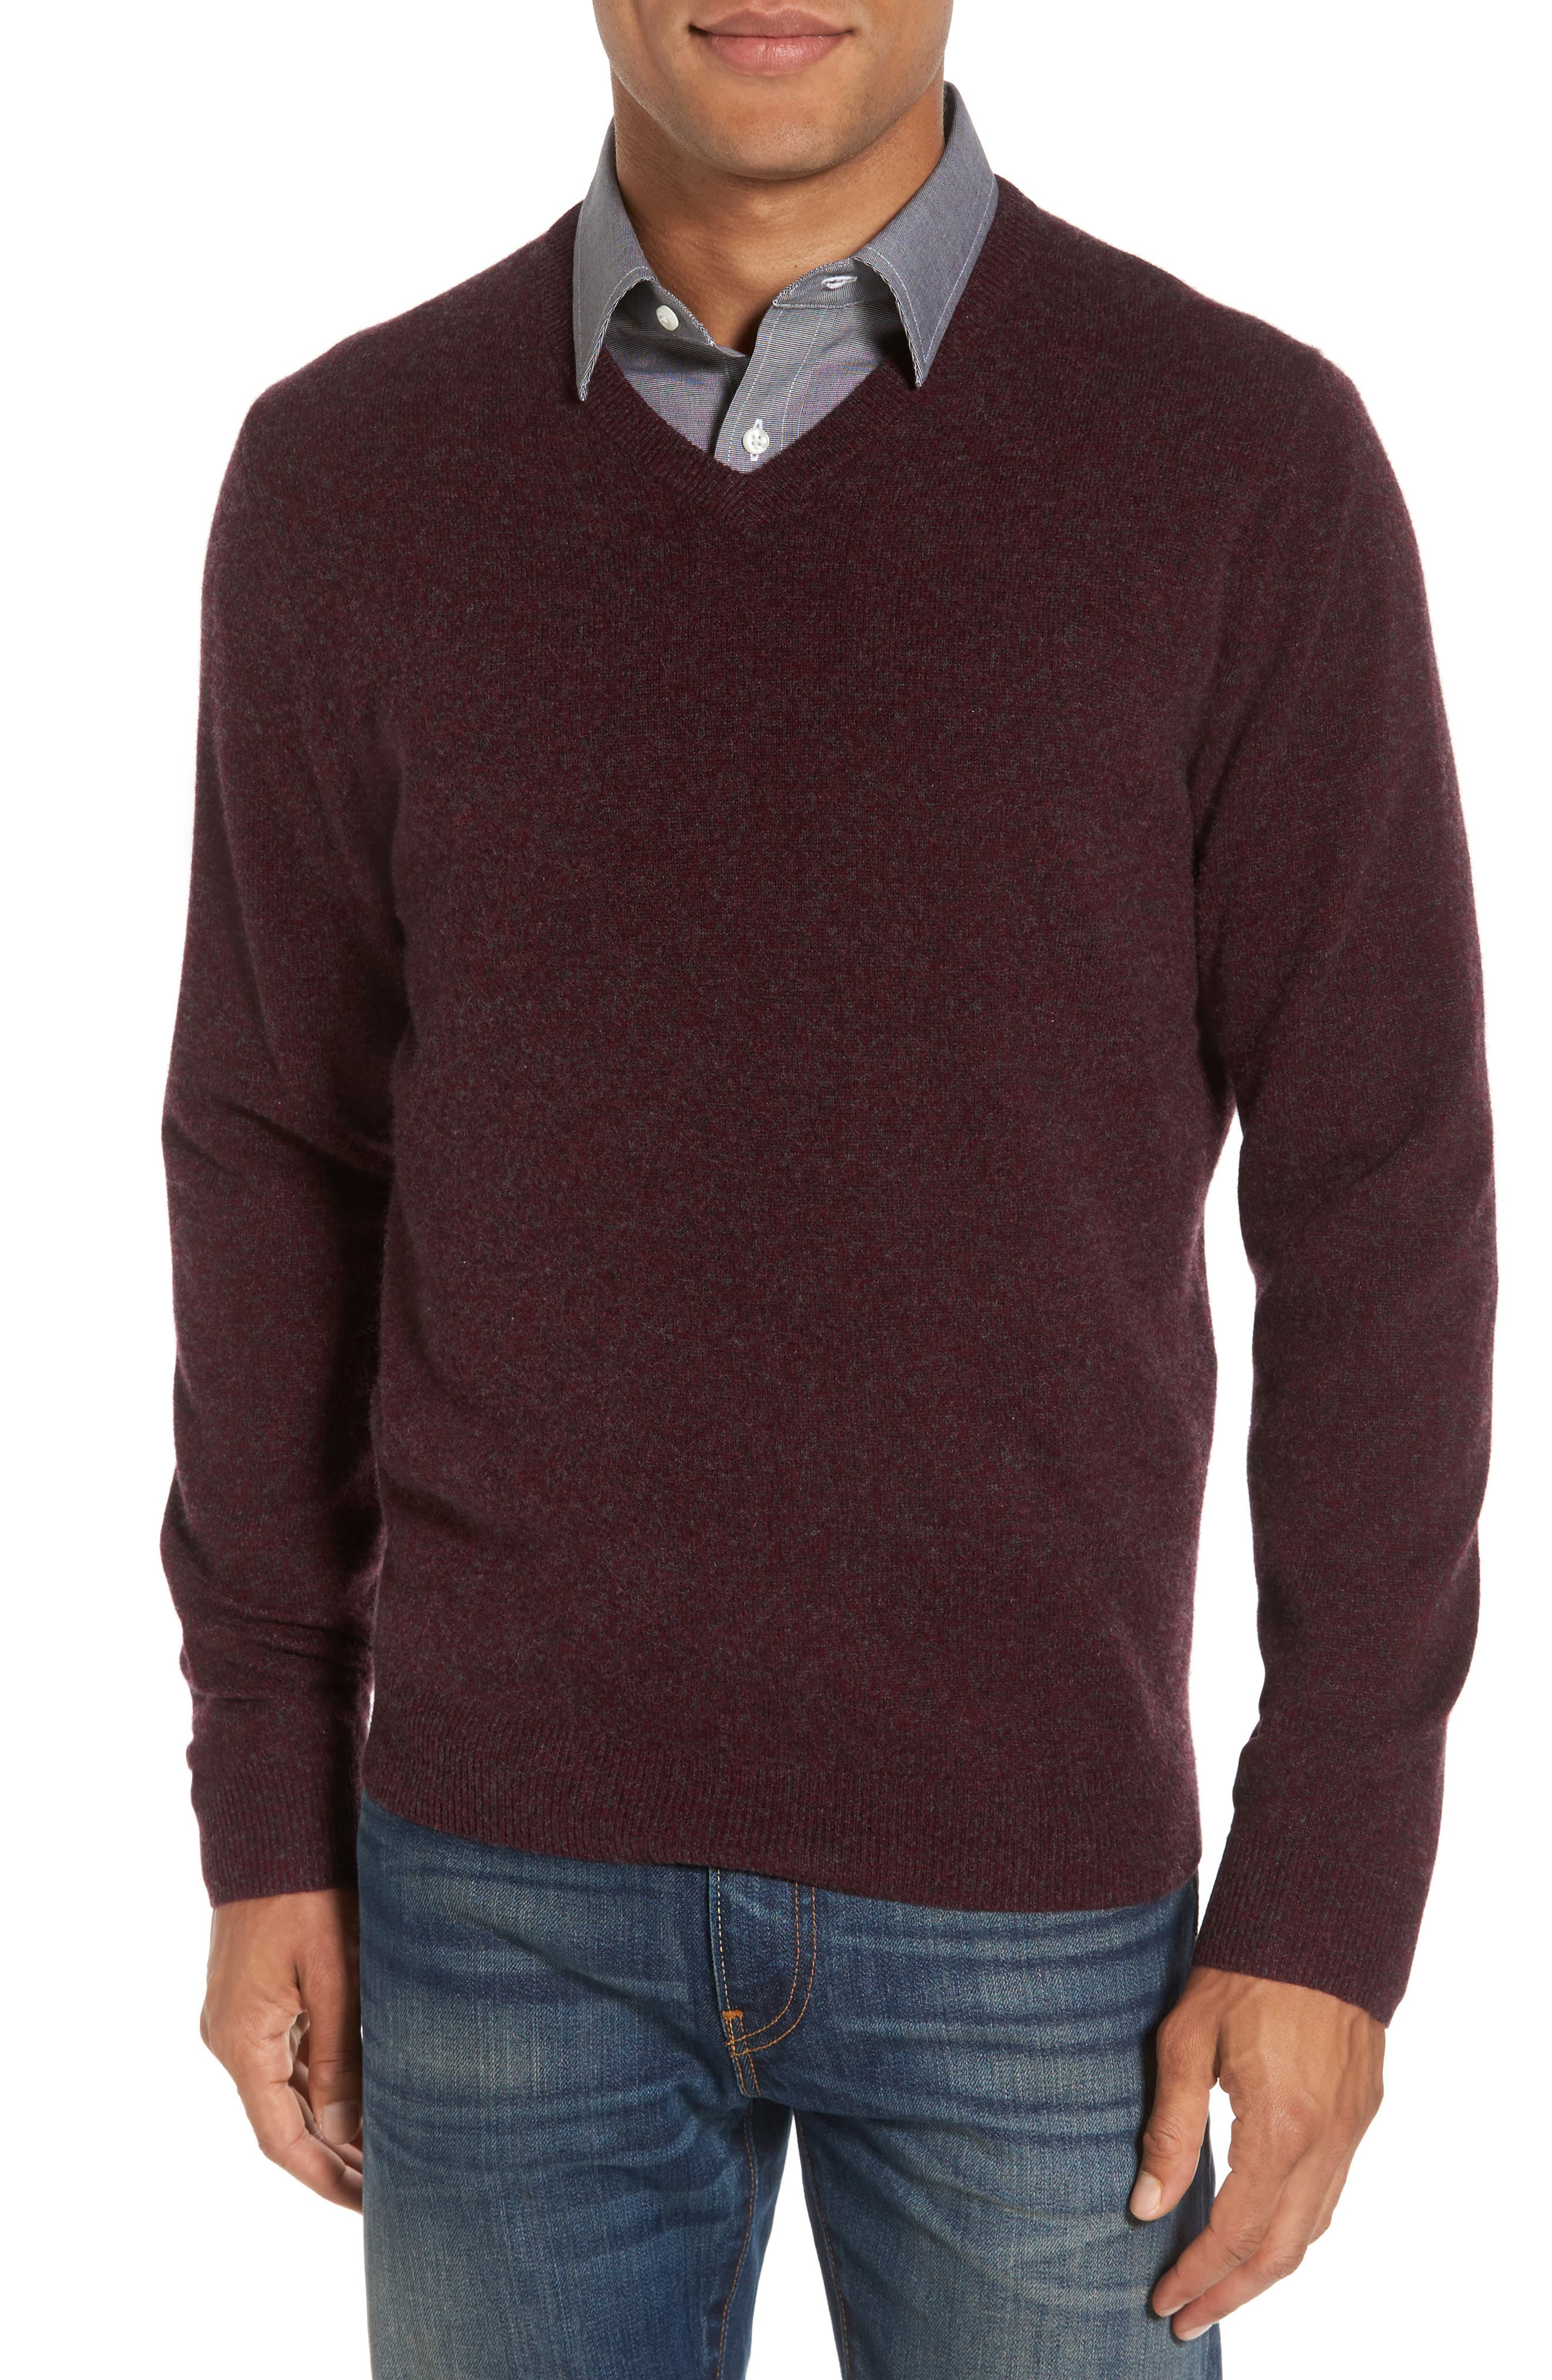 Cashmere V-Neck Sweater,                             Main thumbnail 1, color,                             Burgundy Fudge